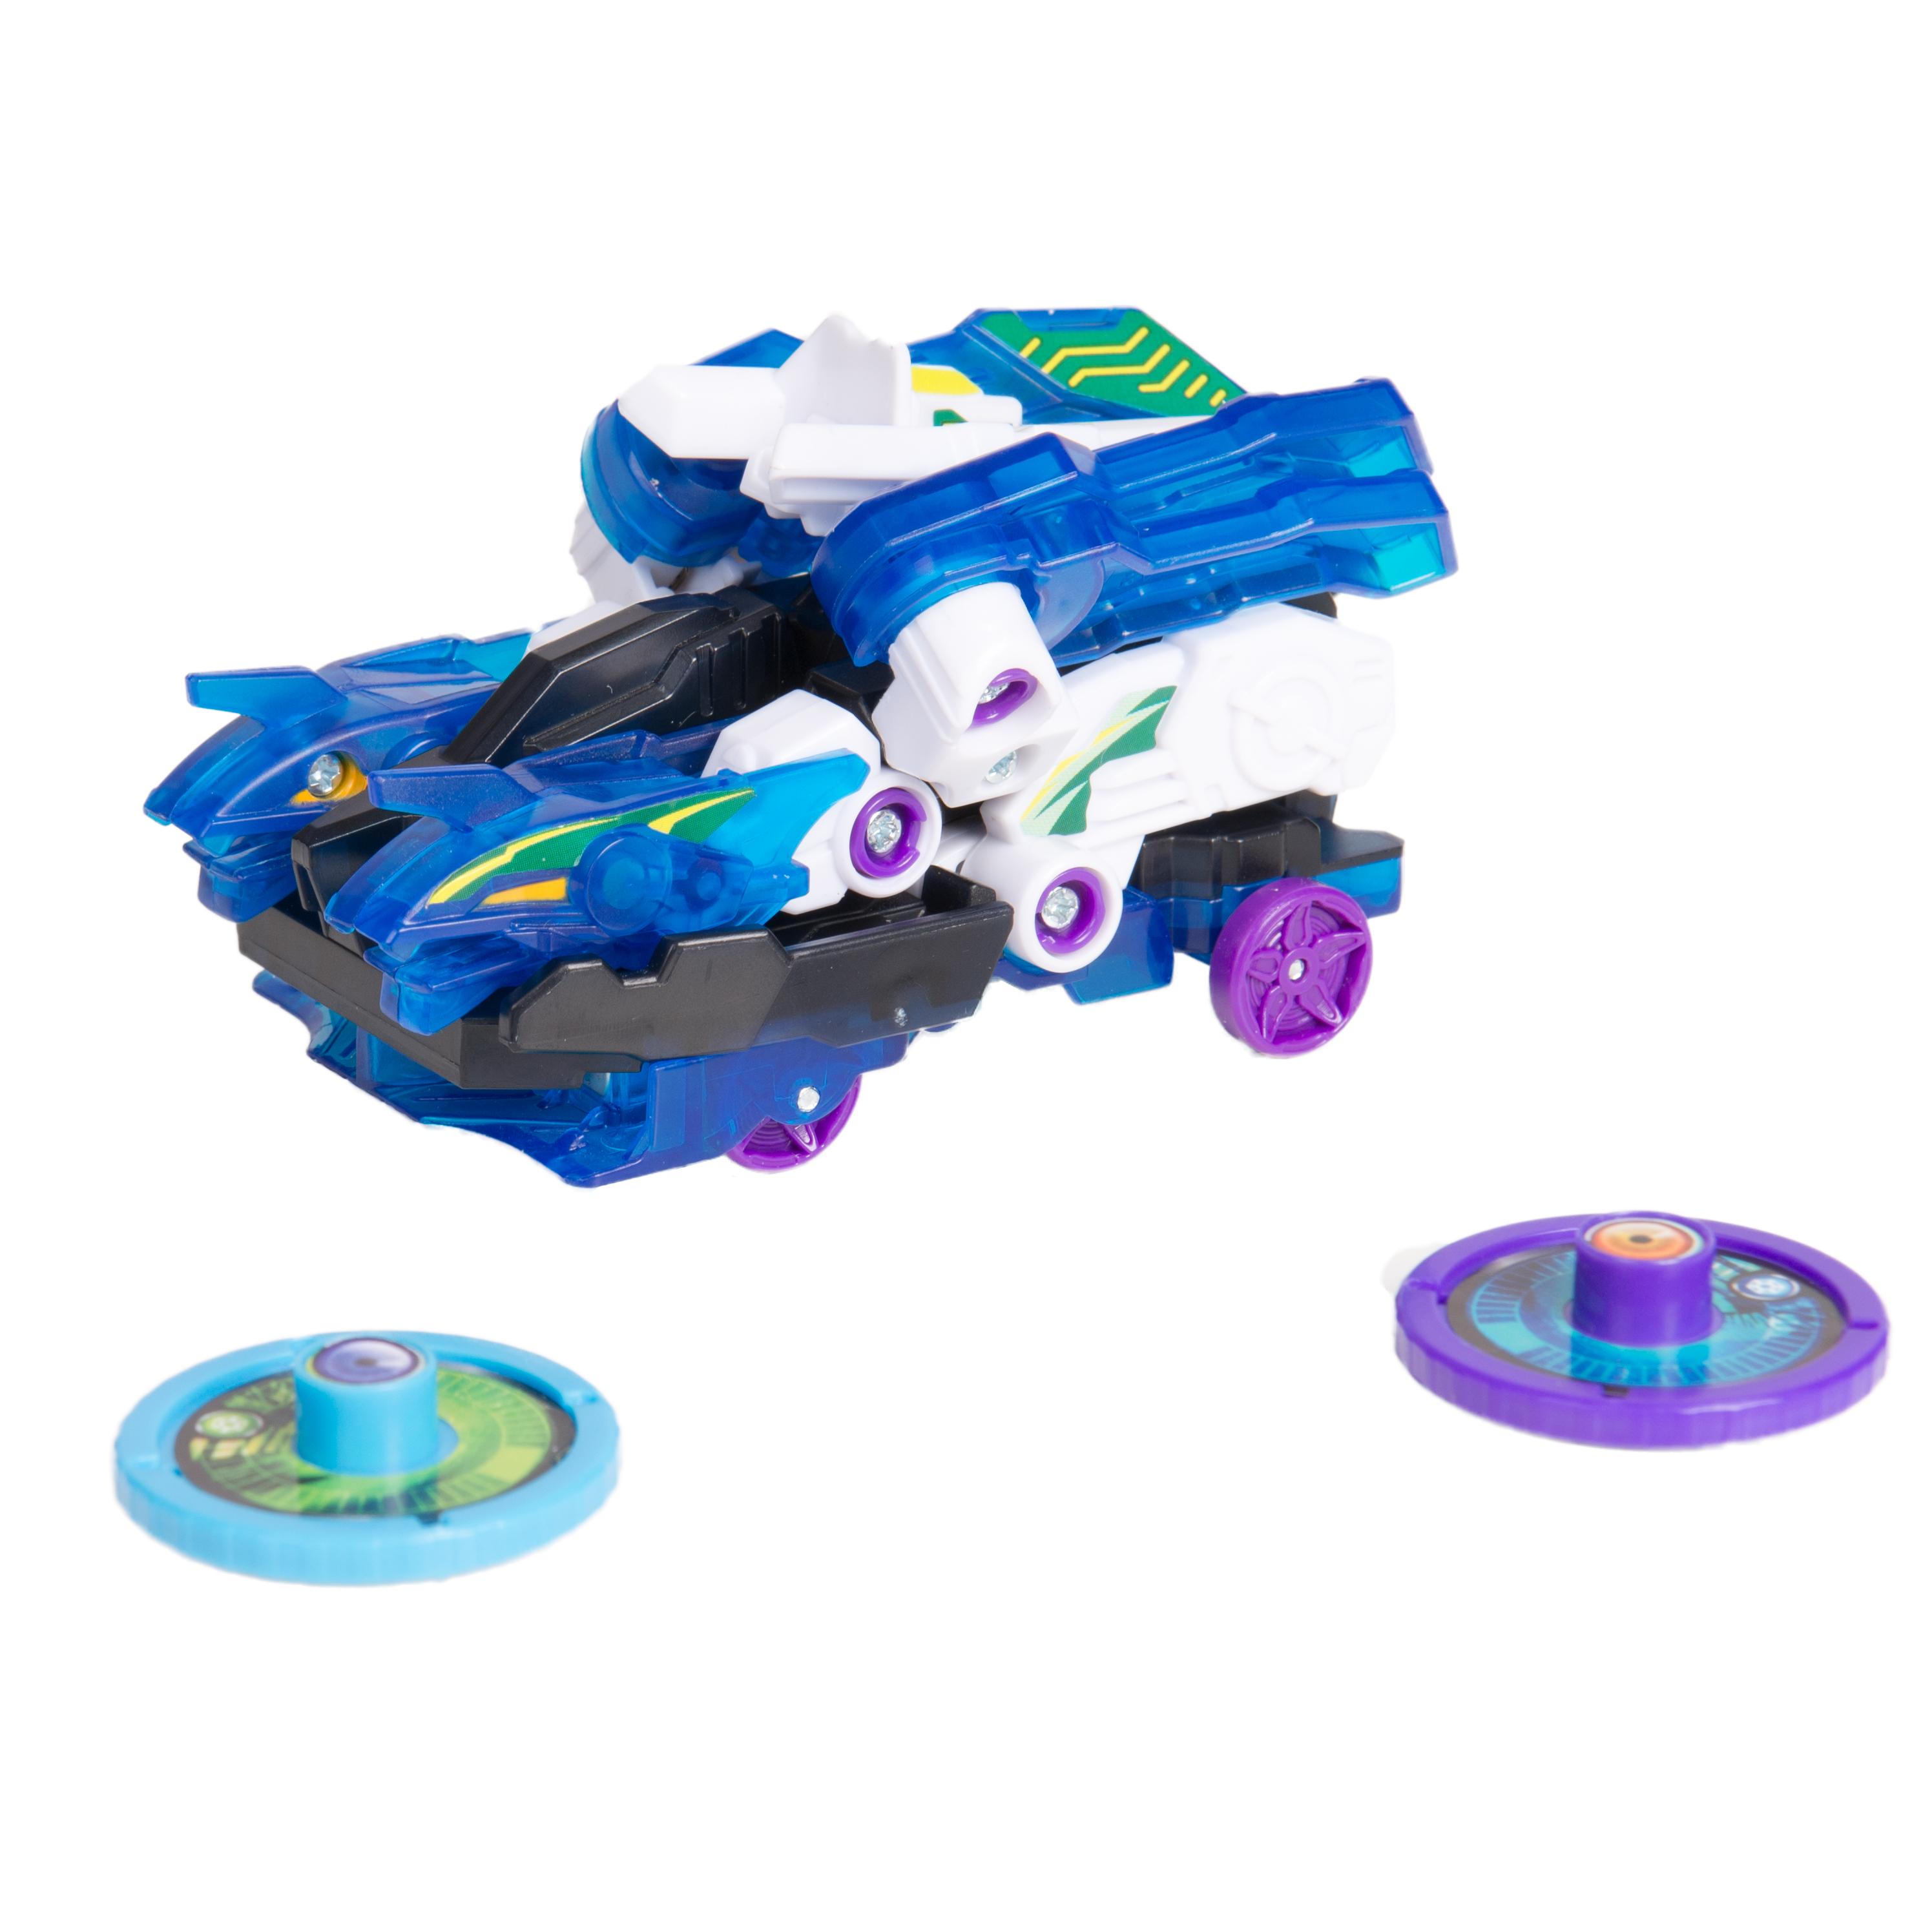 Машинка-трансформер РОСМЭН H2Октан л3 игрушка машинка трансформер дикие скричеры h2октан л3 тм screechers wild 35896